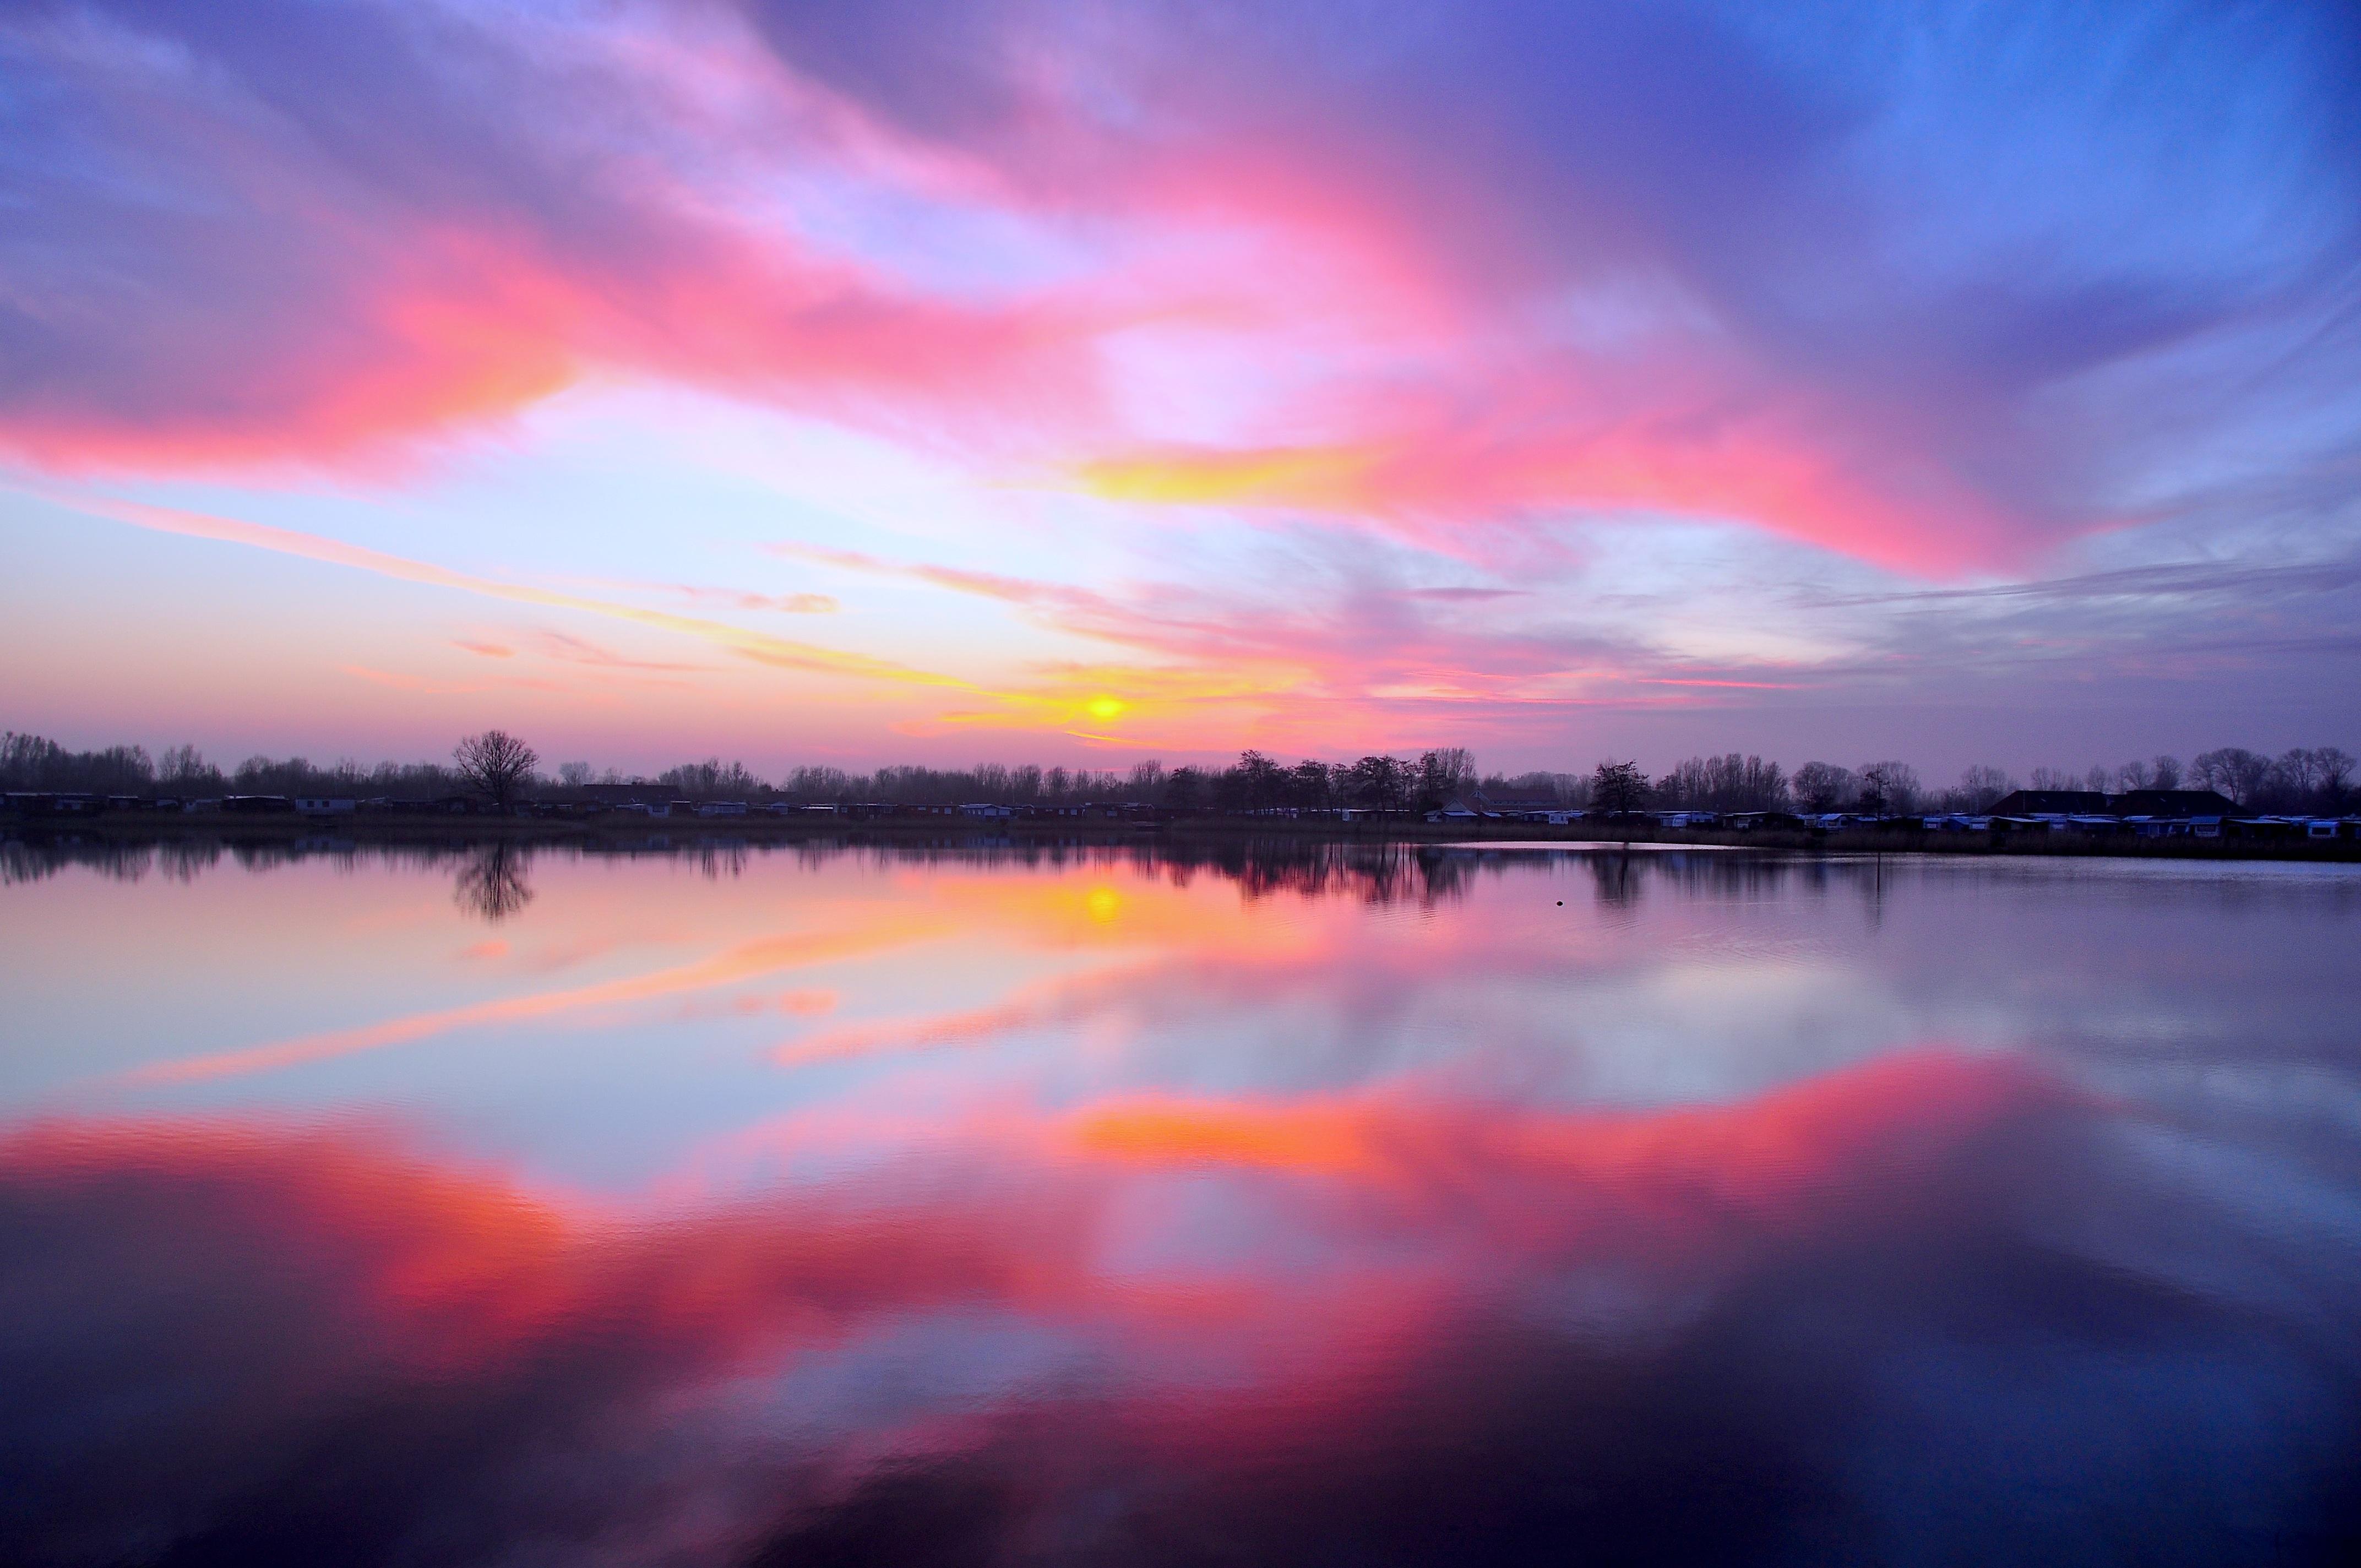 Sunset Reflection - Free Stock Photos | Life of Pix